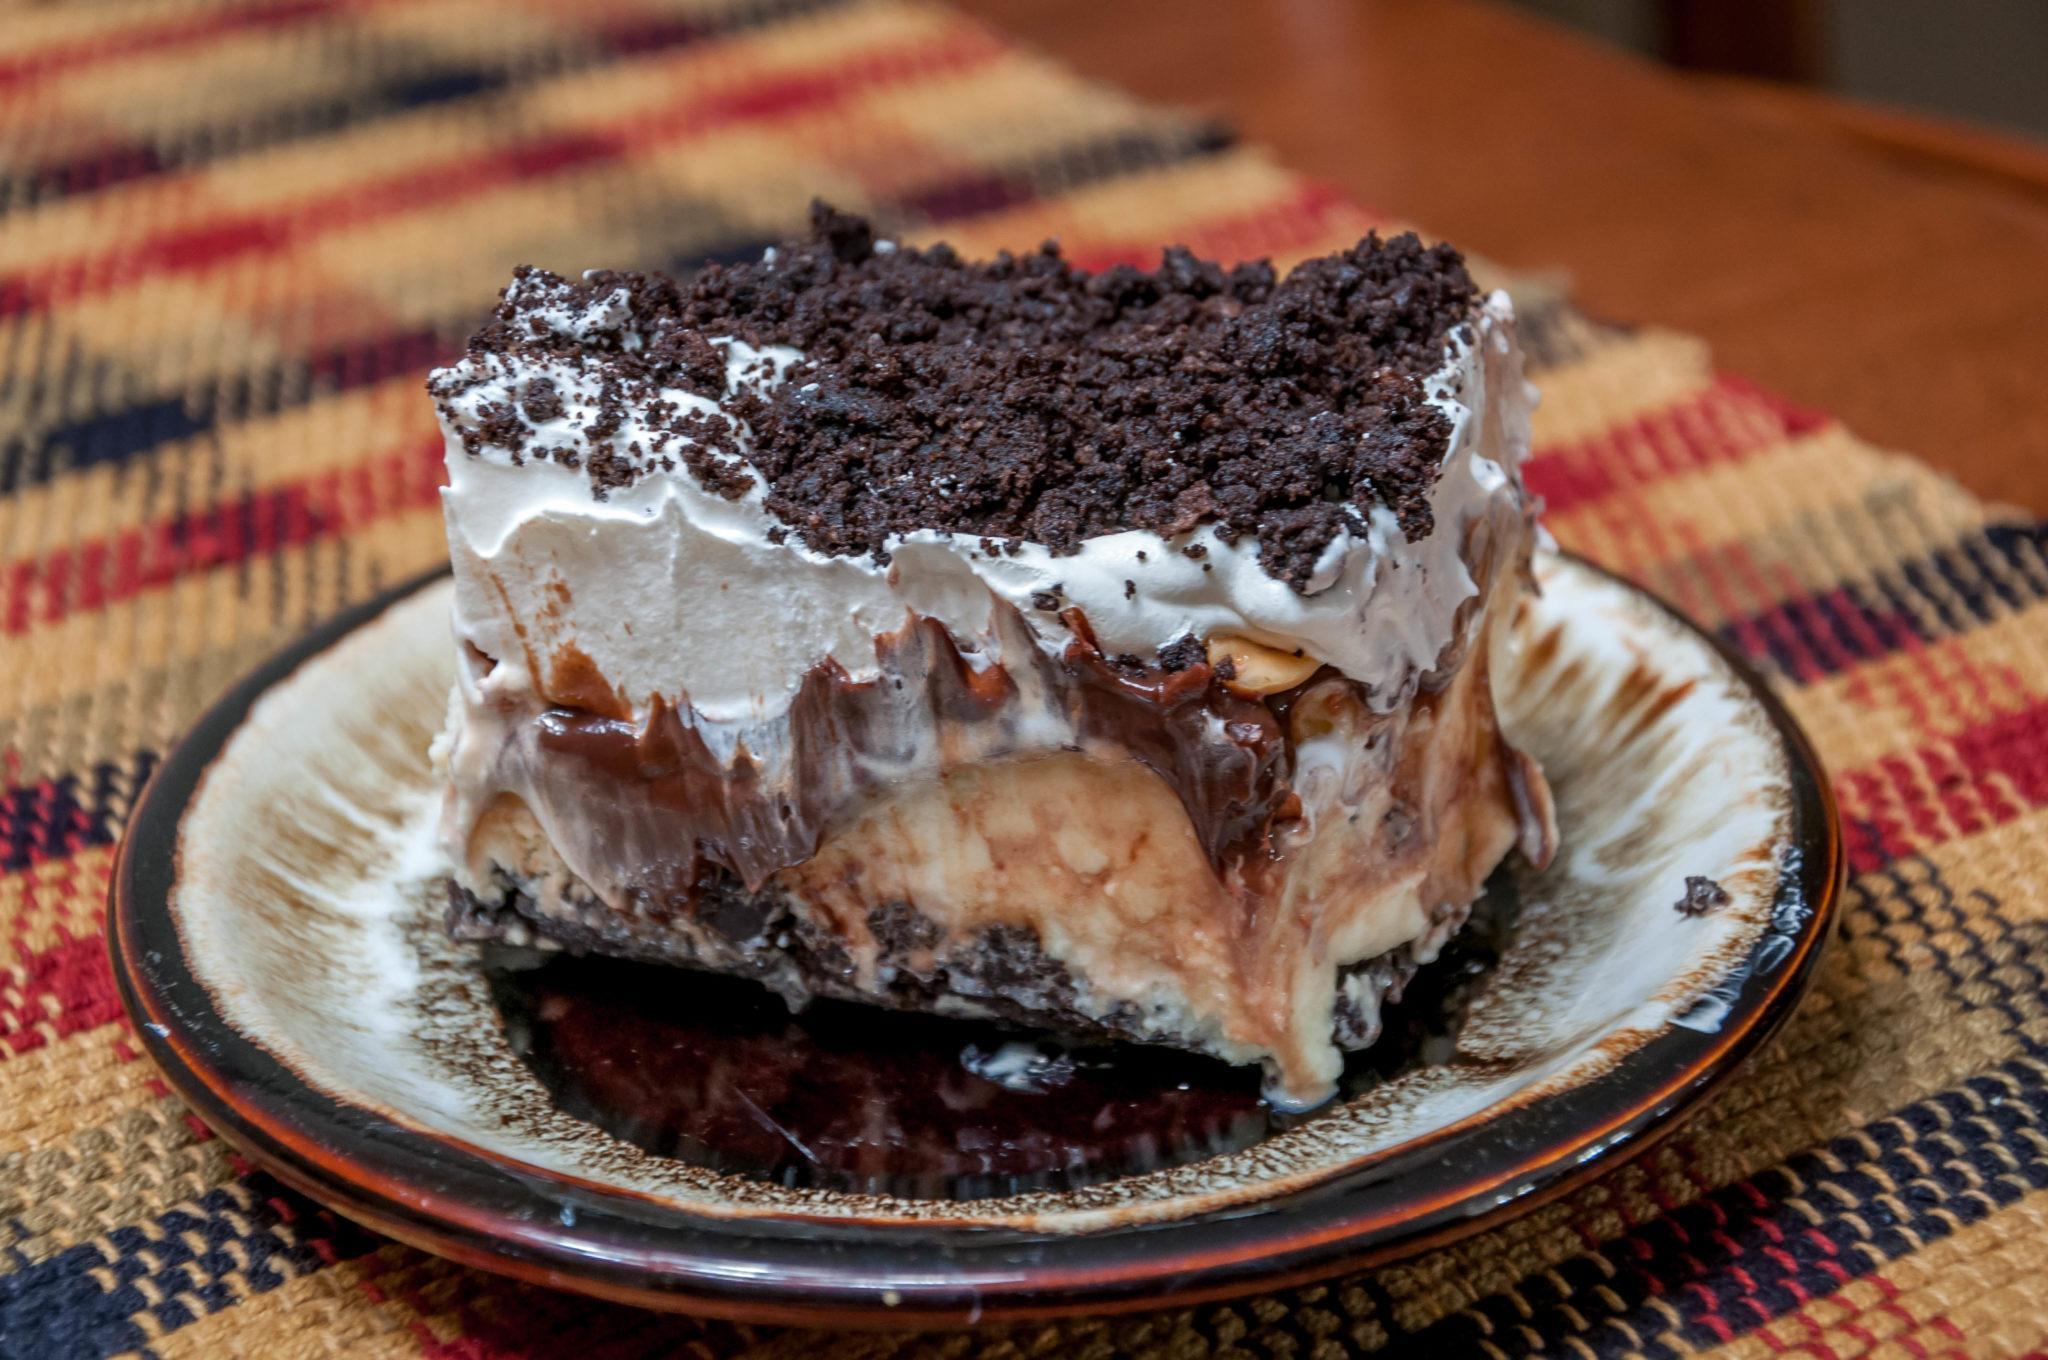 The Buster Bar dessert on plate